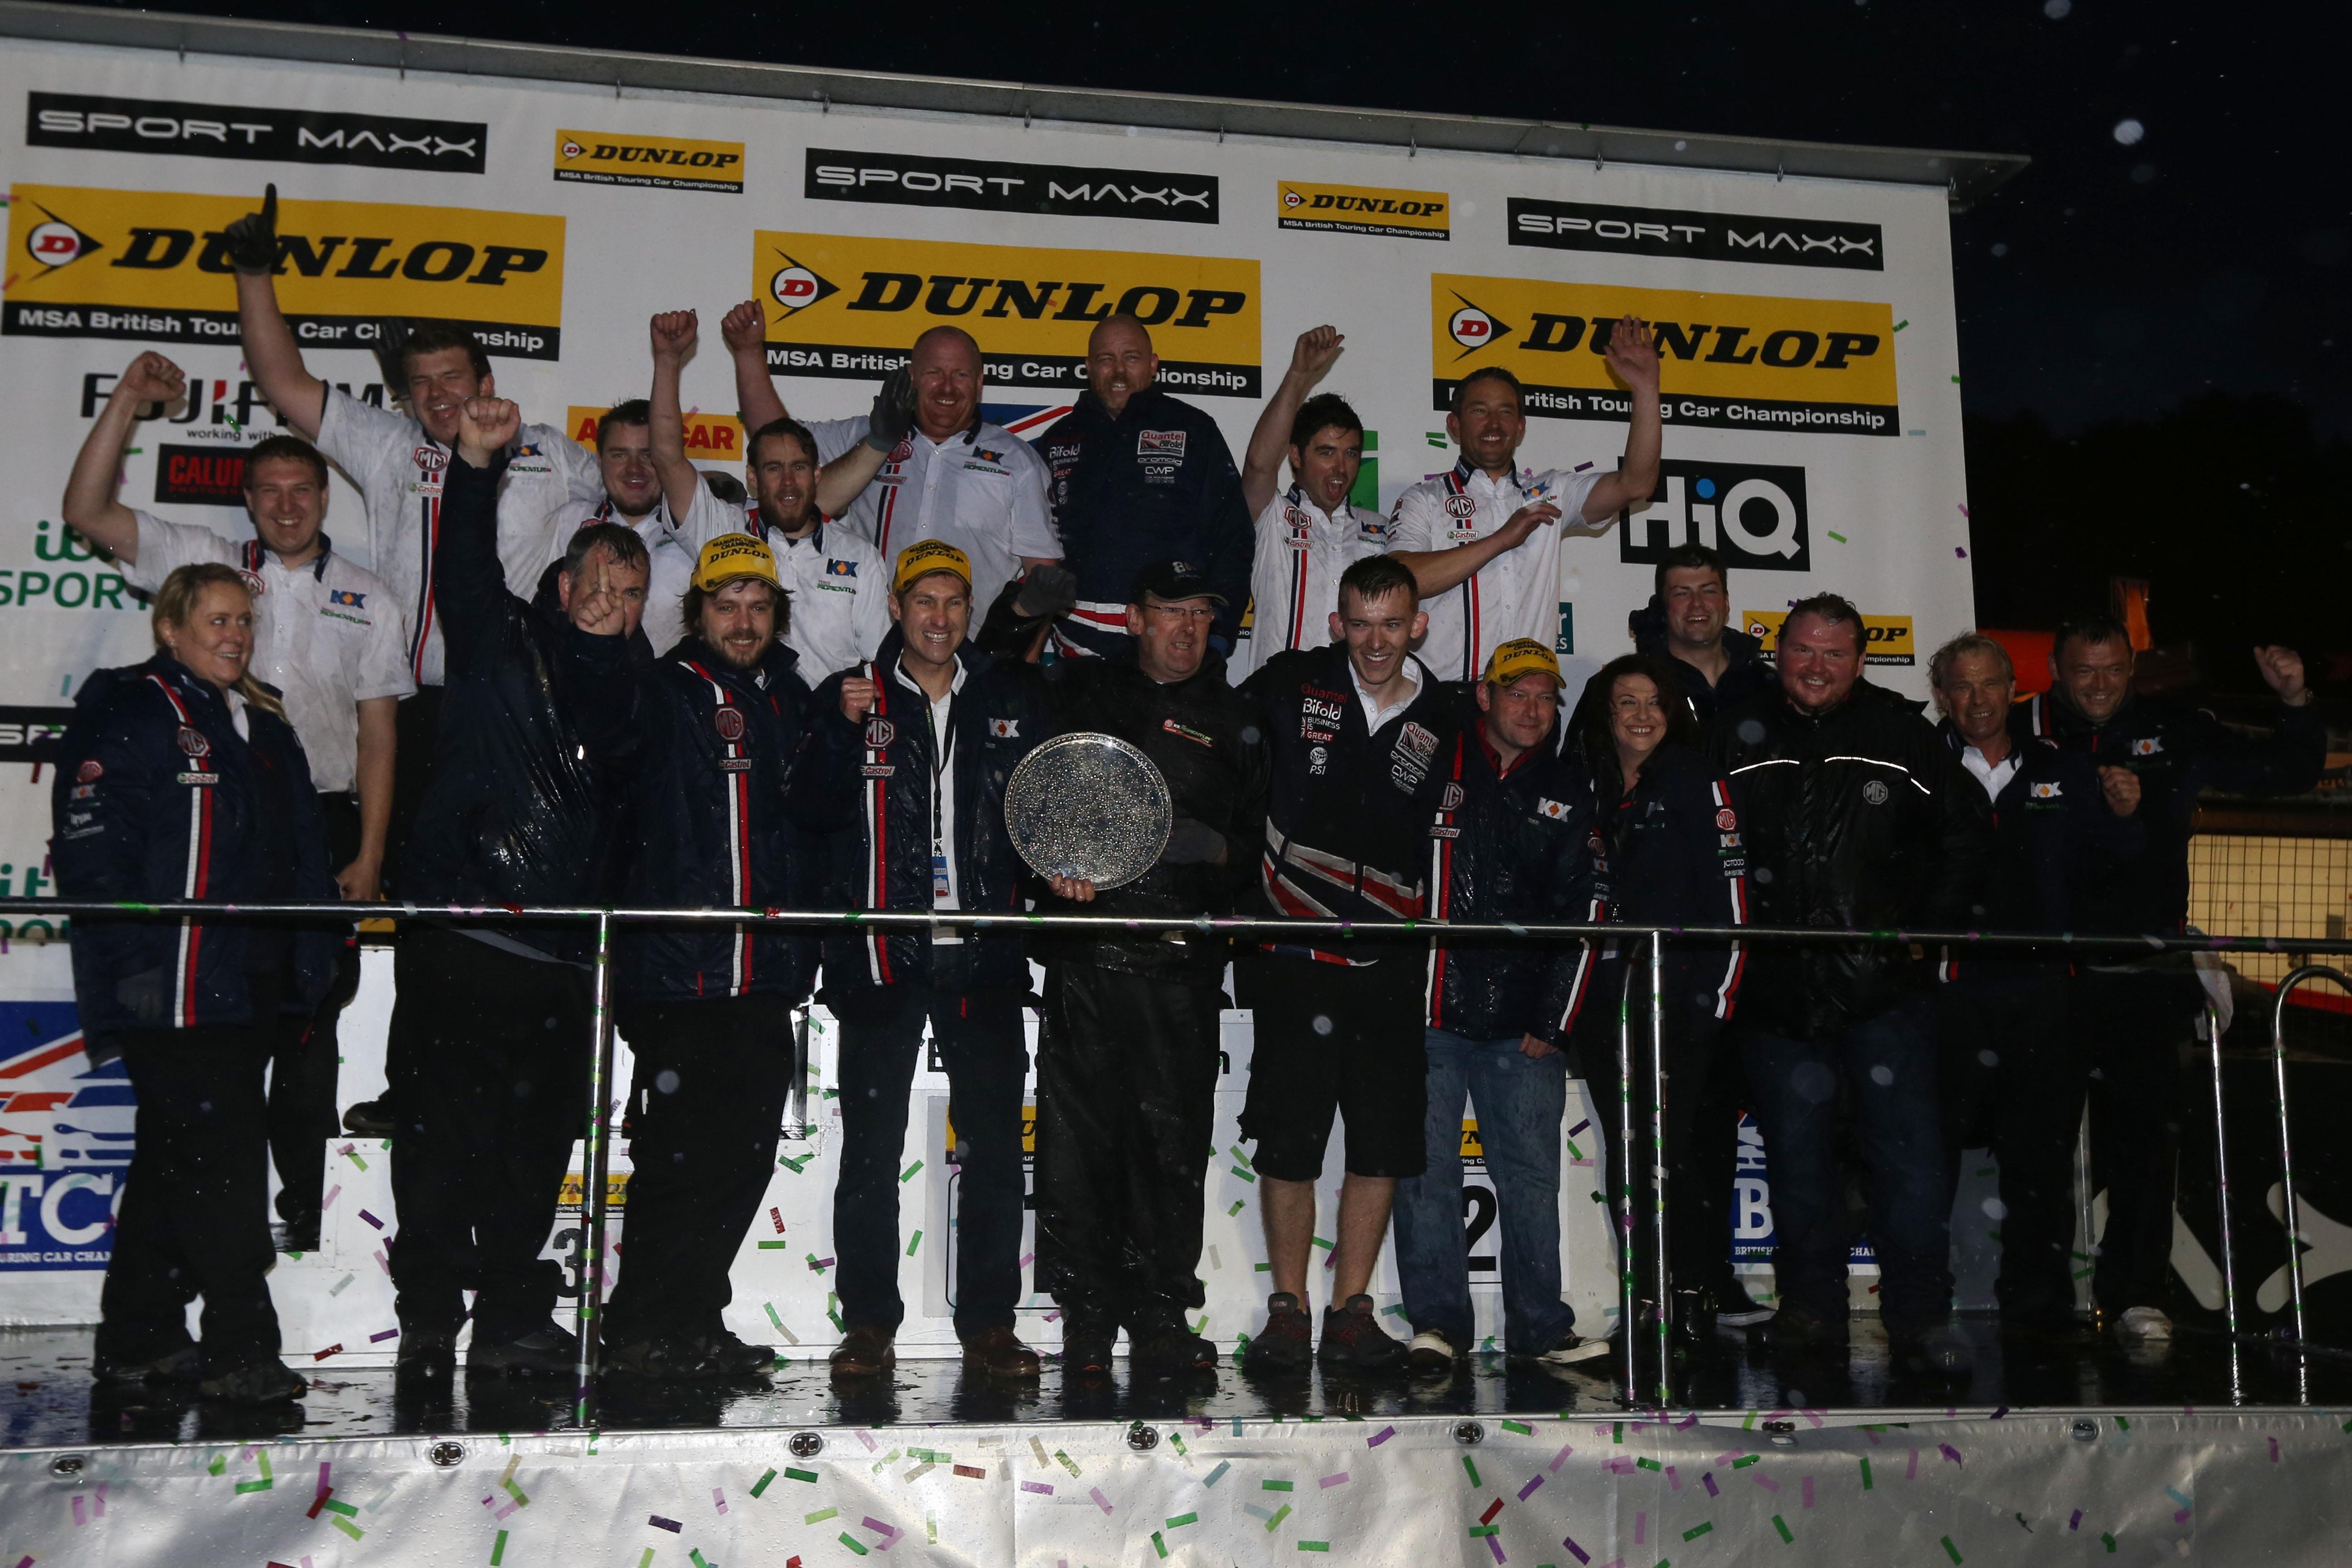 MG wins first British Touring Car Championship manufacturer title